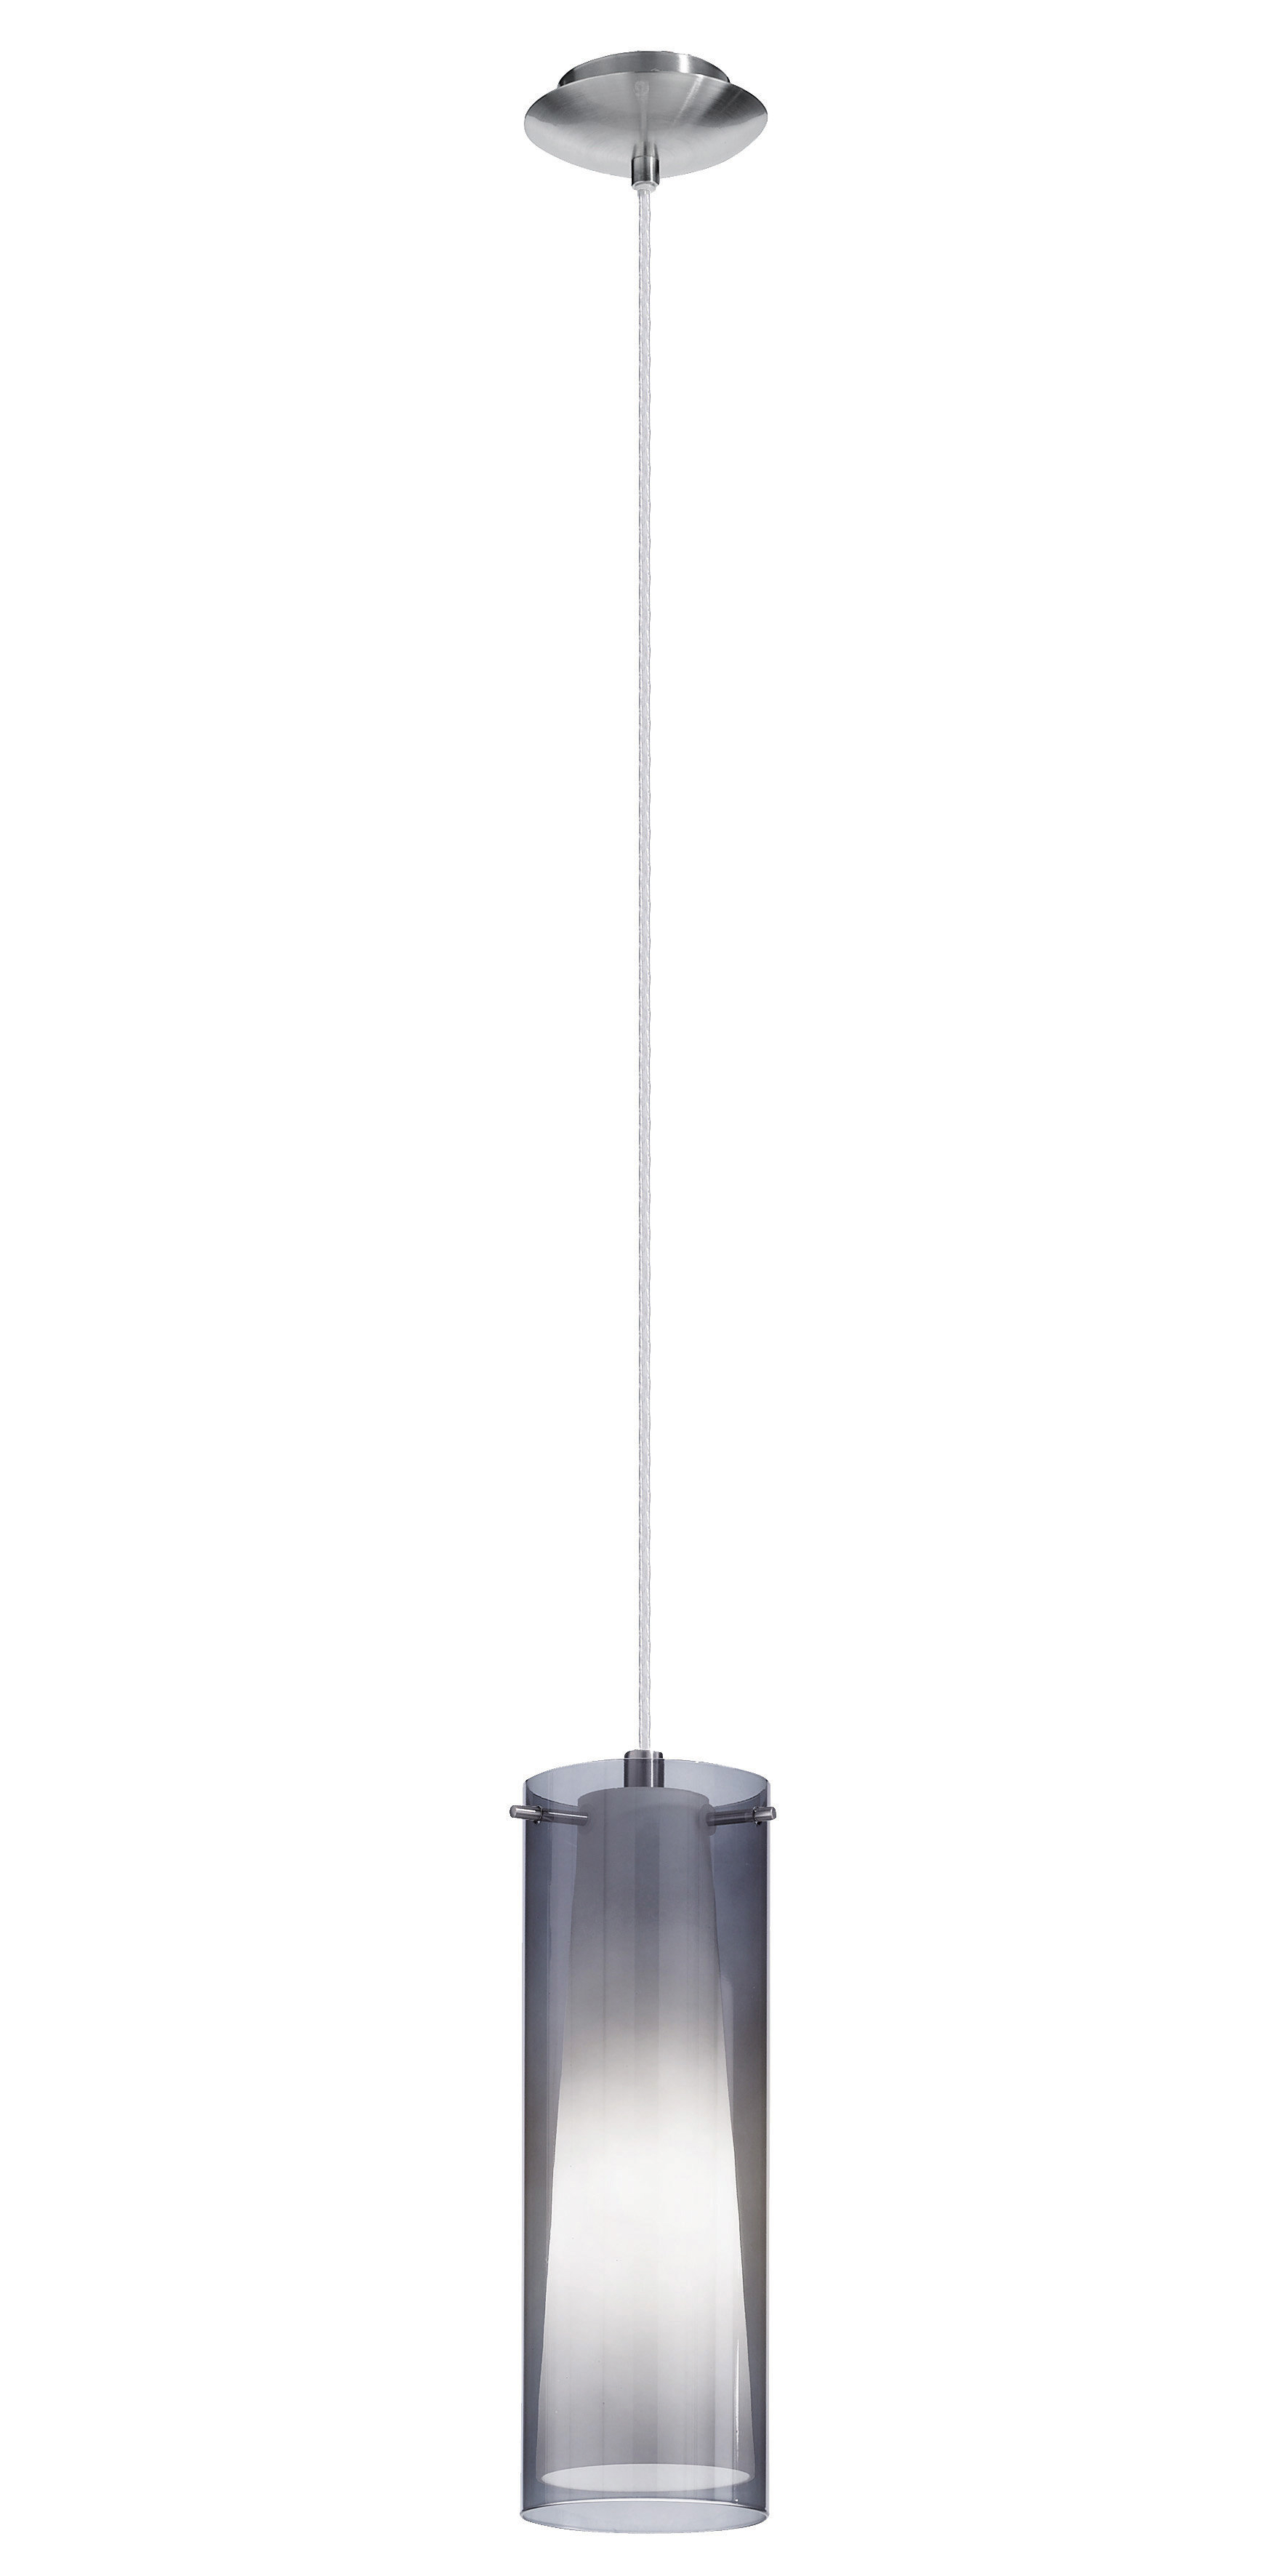 Julia 1 Light Single Cylinder Pendant Regarding Bainbridge 1 Light Single Cylinder Pendants (View 15 of 30)